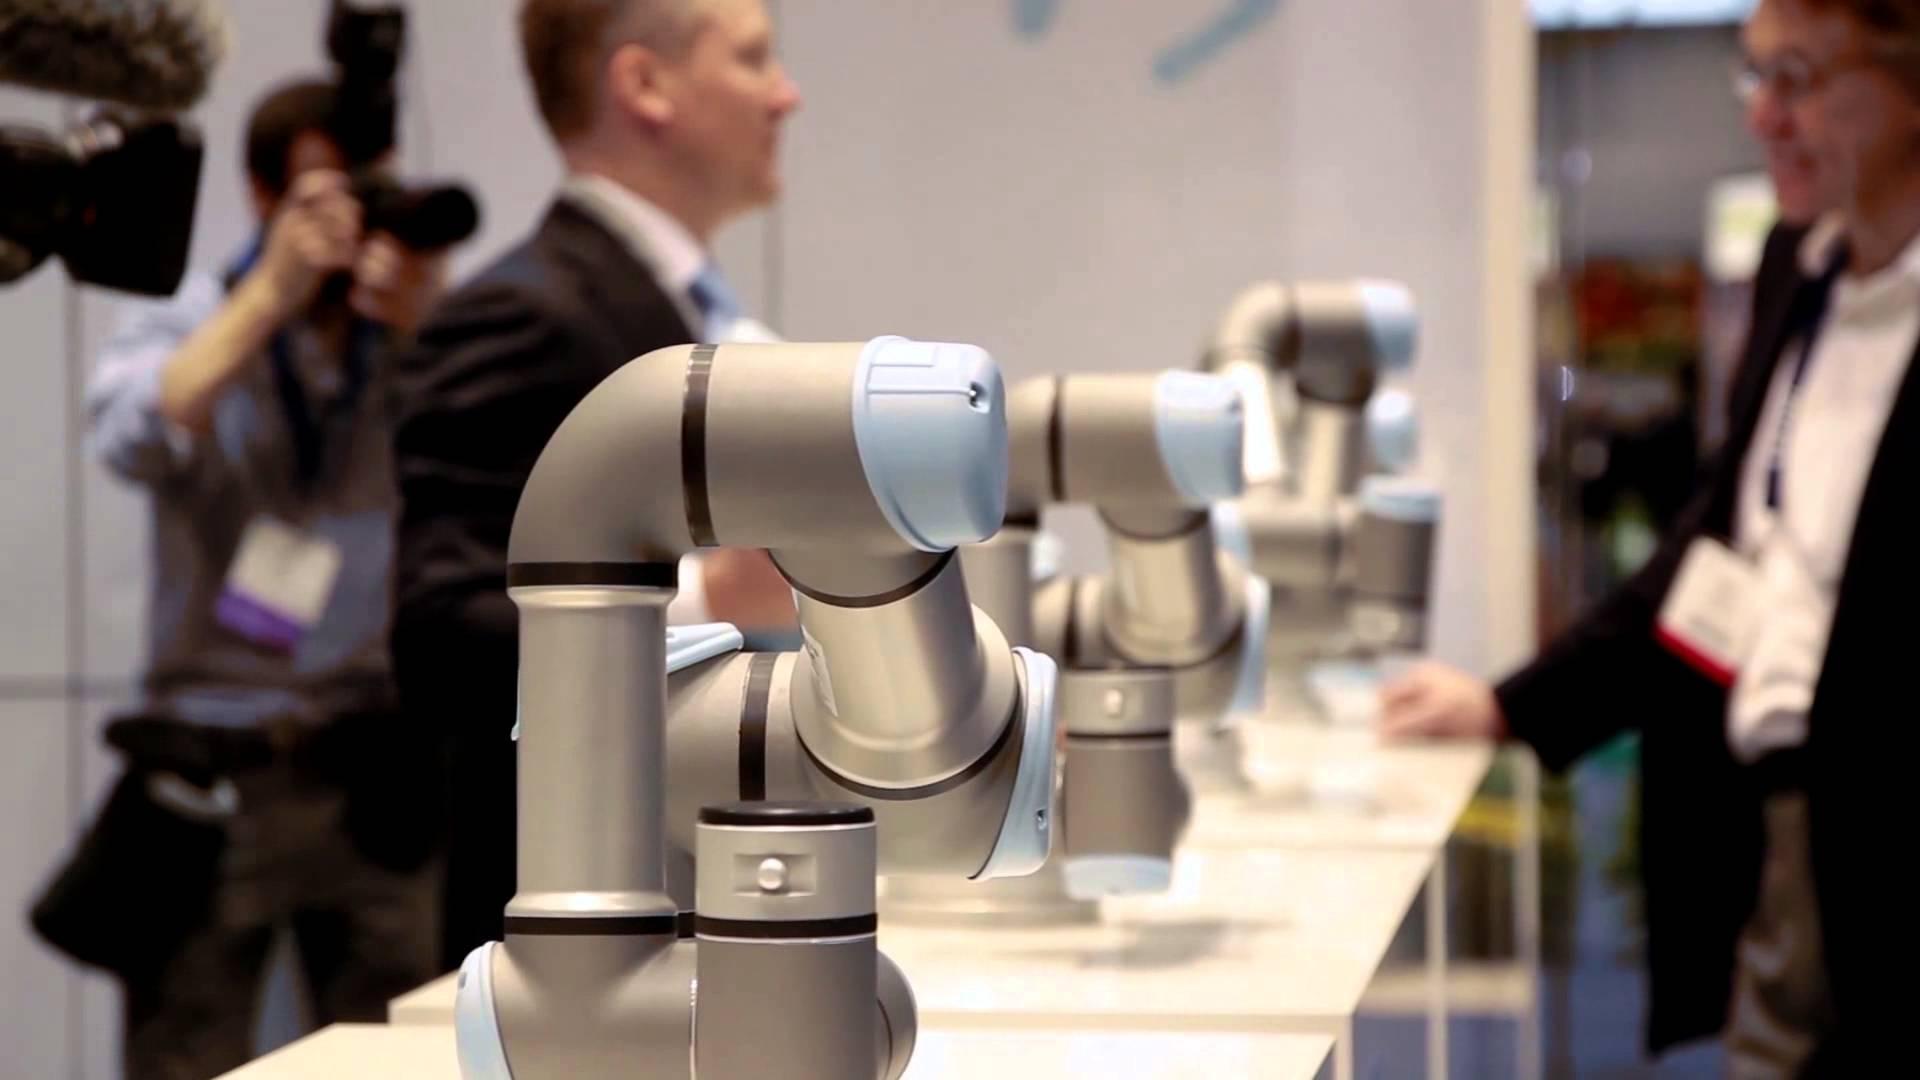 universal robots automate show